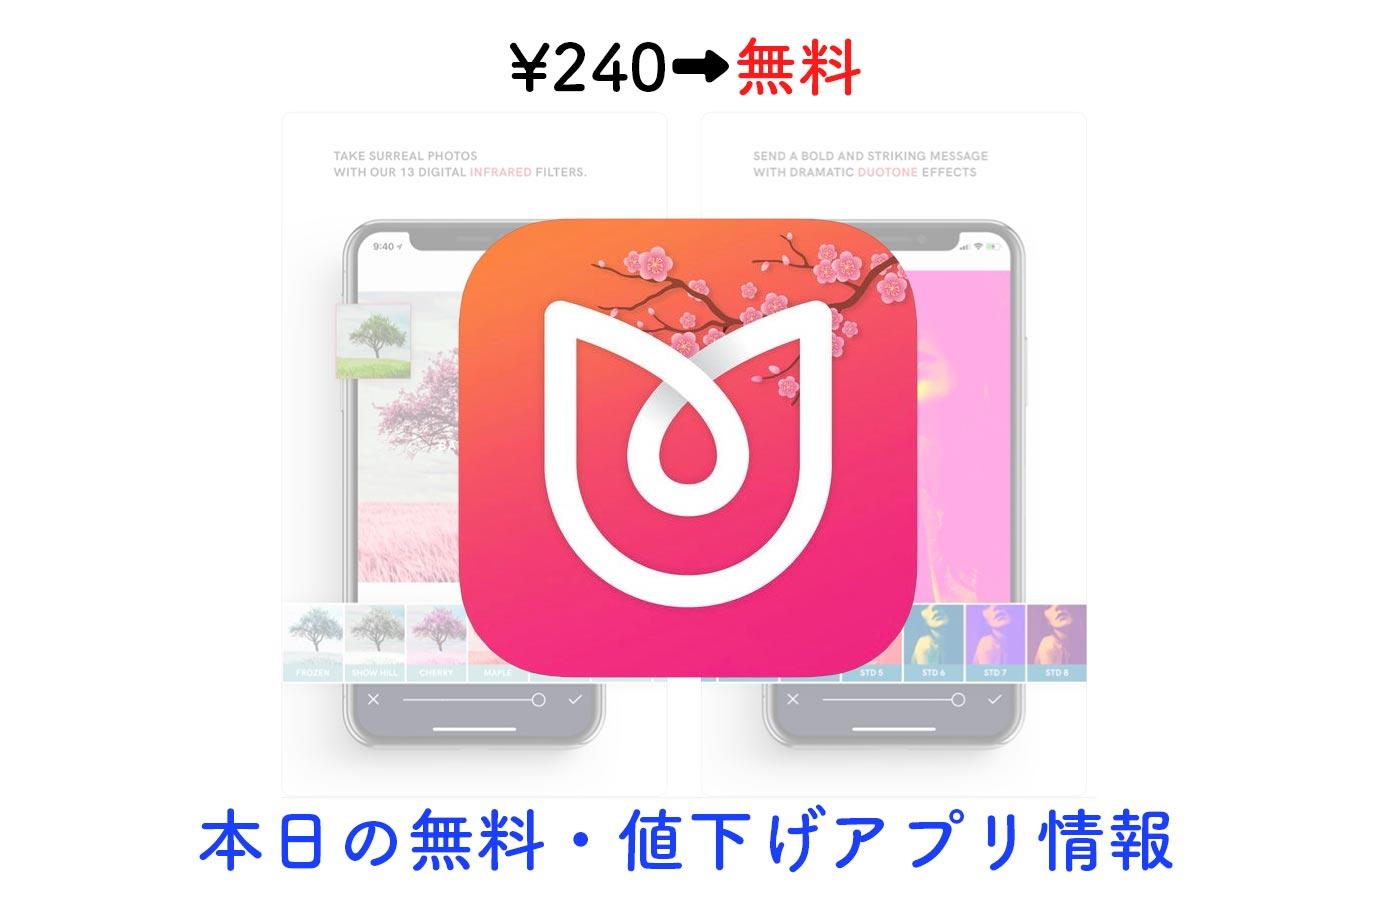 Appsale0601